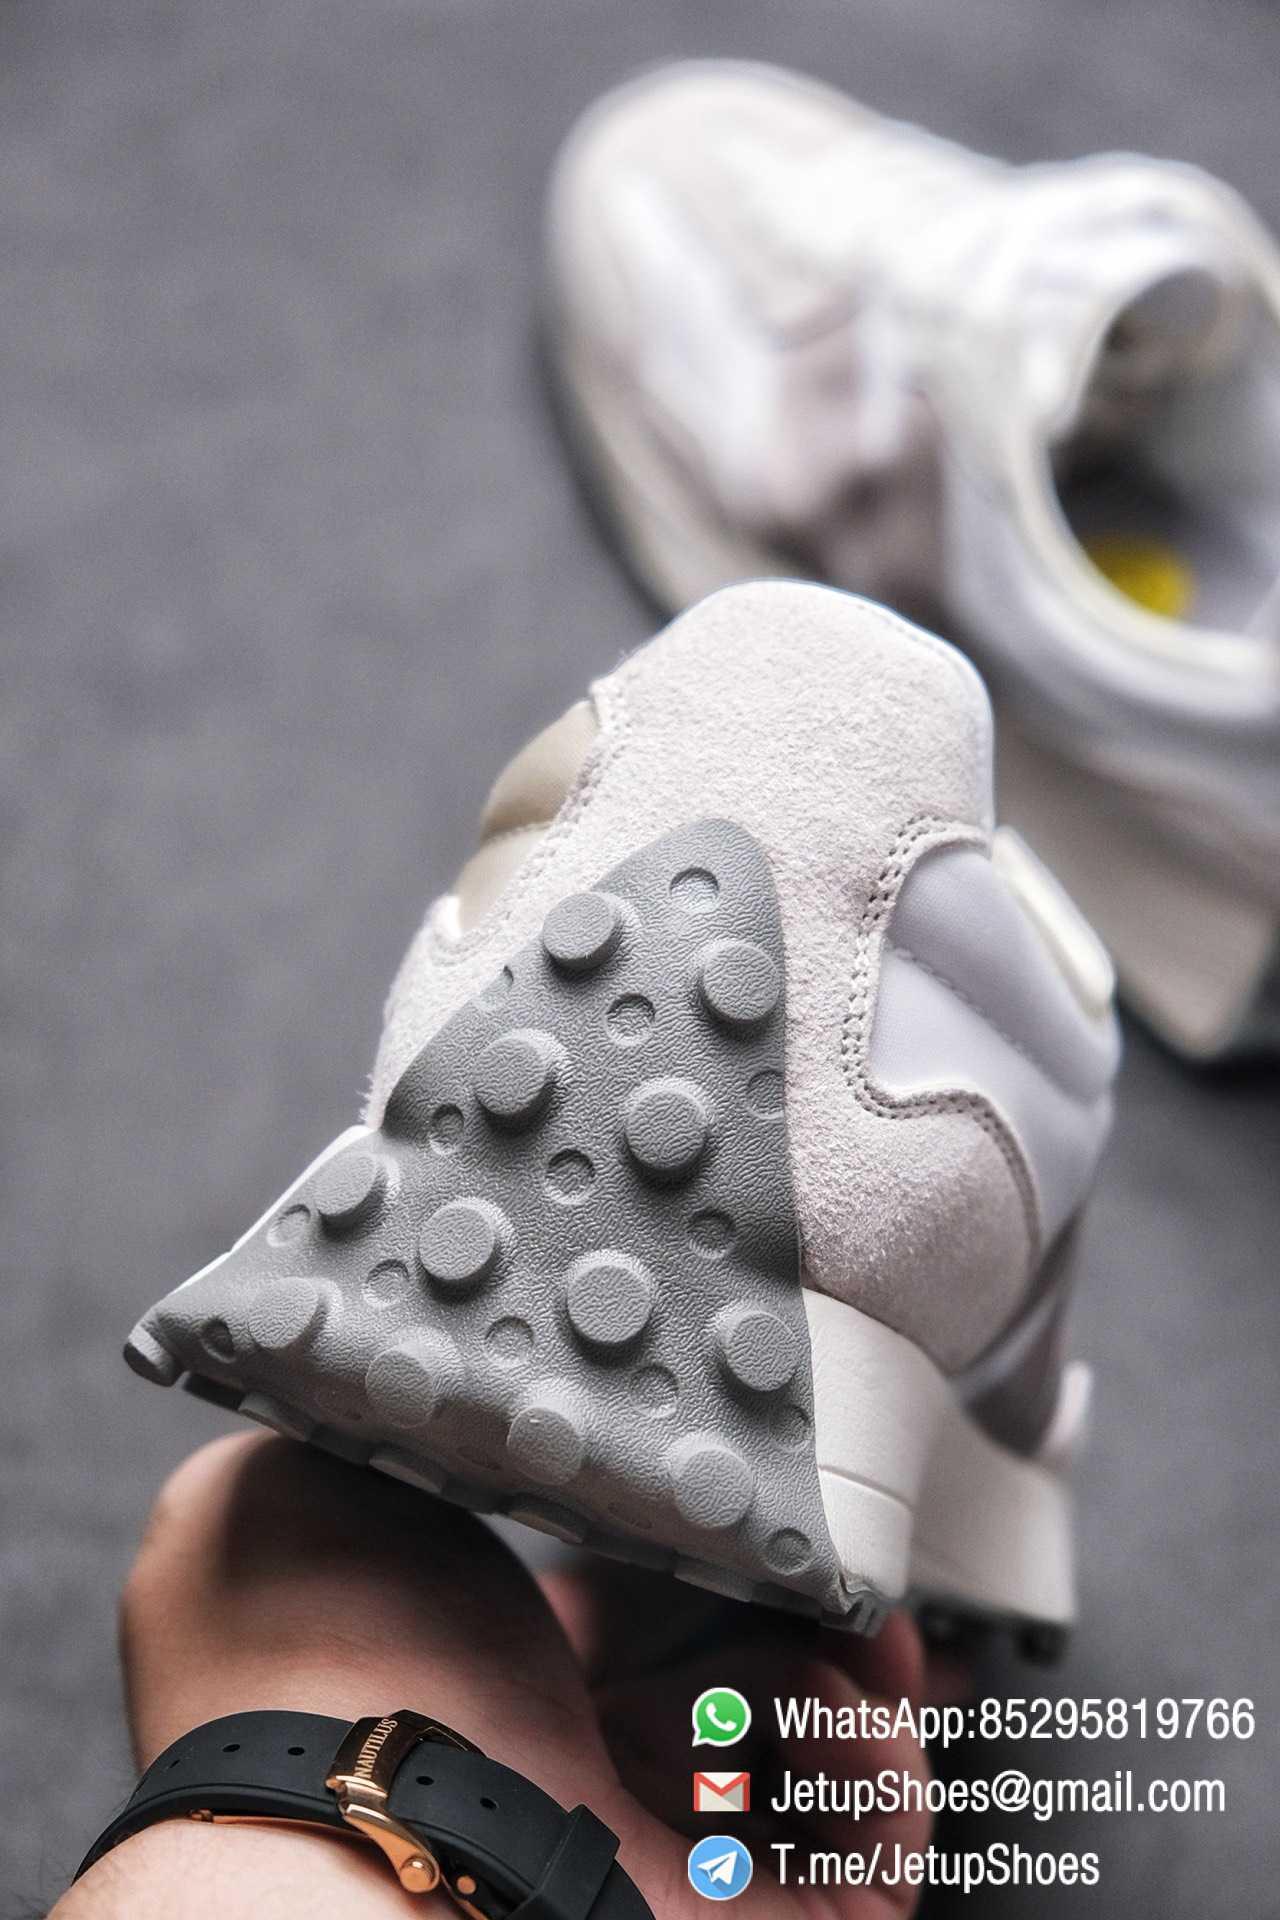 Replica Sneakers New Balance 327 Noritake x 327 Light Grey White Retro Running Shoes SKU MS327NW1 Best RepSneakers 08